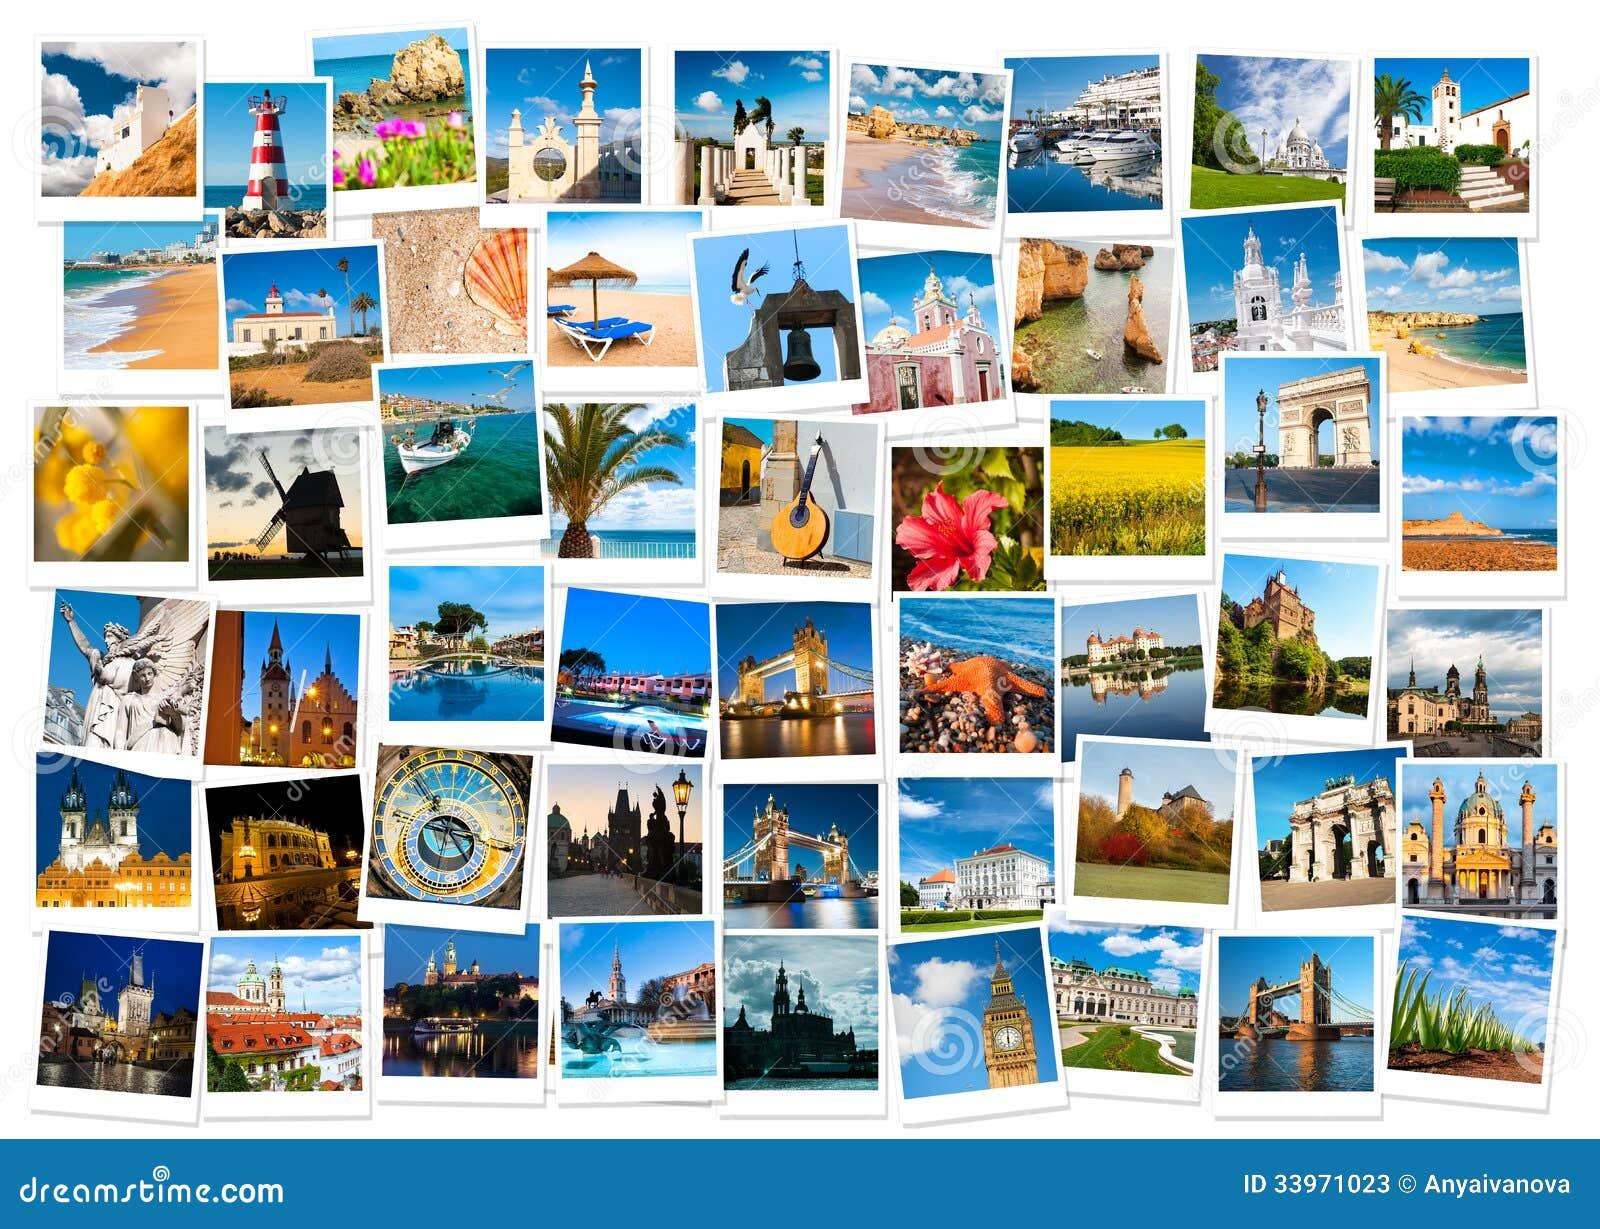 Design Photo Collage Template